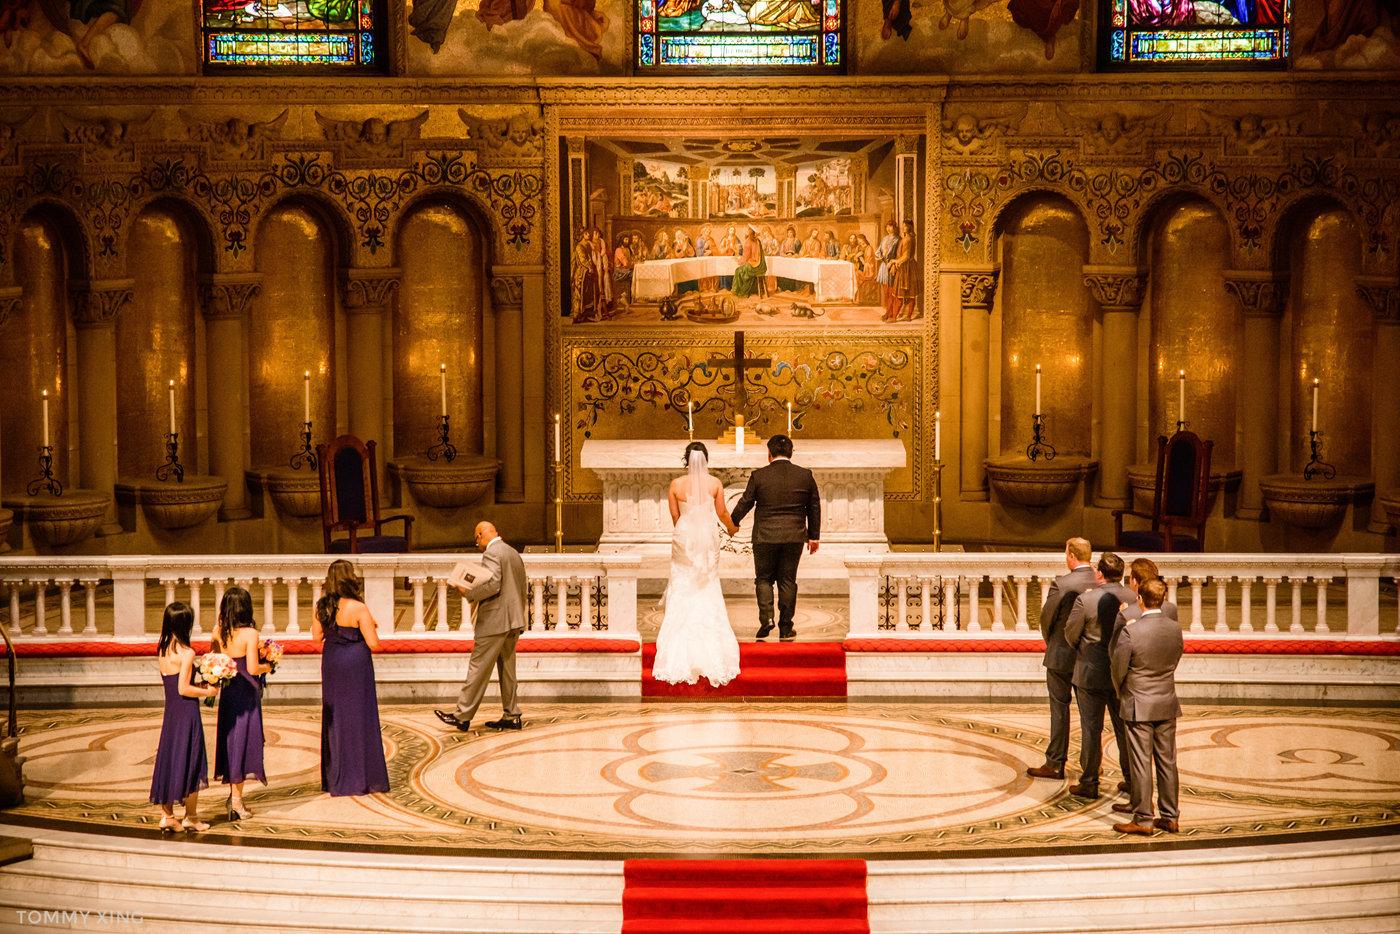 STANFORD MEMORIAL CHURCH WEDDING - Wenjie & Chengcheng - SAN FRANCISCO BAY AREA 斯坦福教堂婚礼跟拍 - 洛杉矶婚礼婚纱照摄影师 Tommy Xing Photography106.jpg